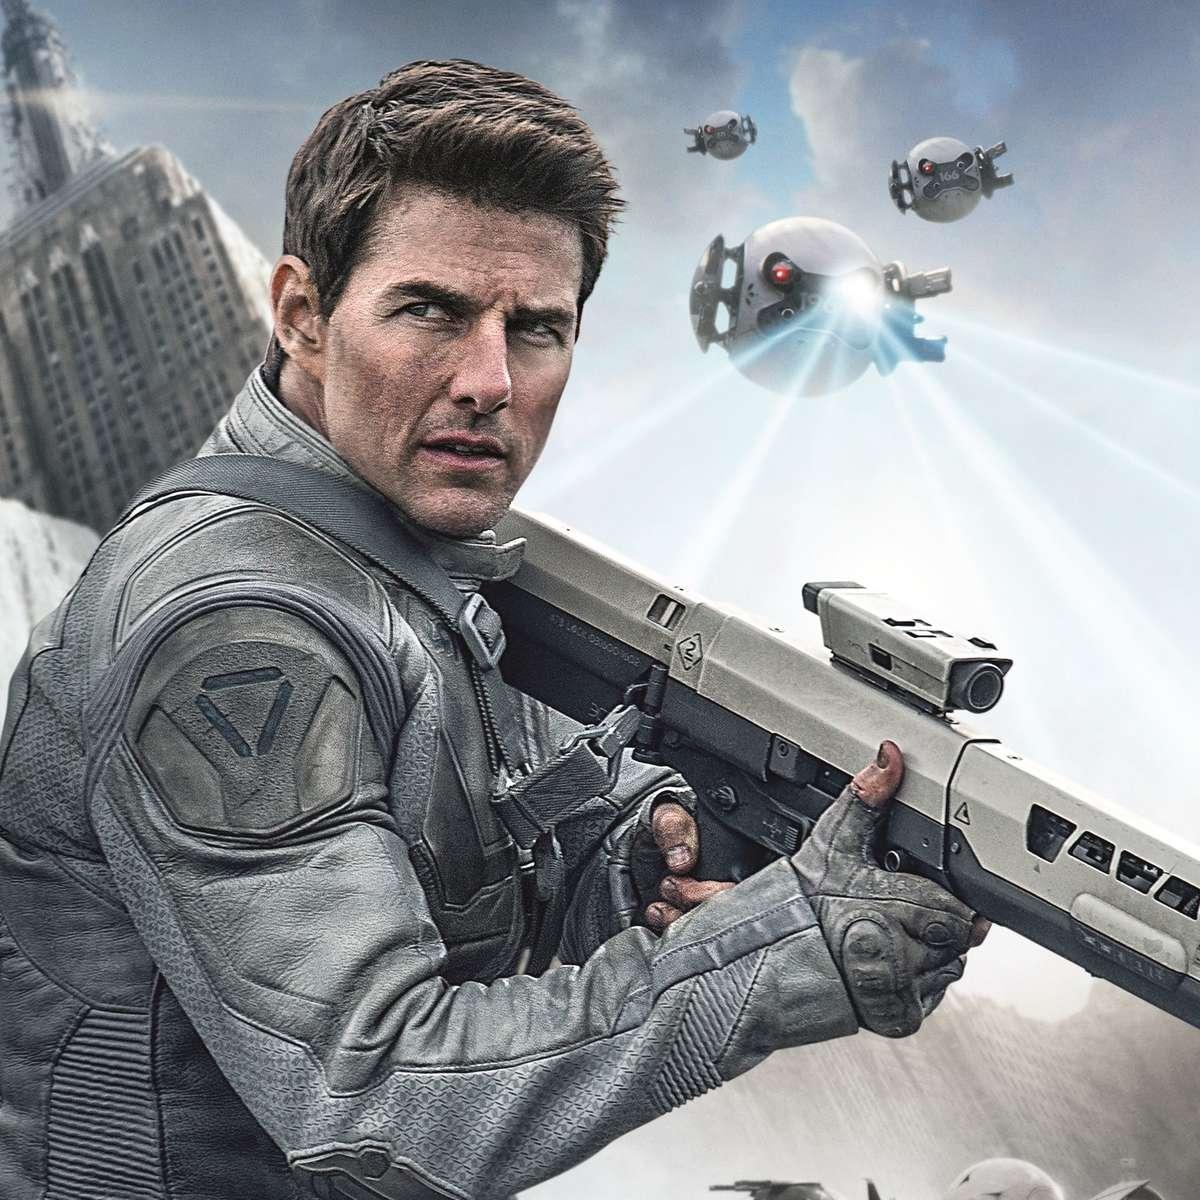 tom_cruise_in_oblivion_movie-2880x1800.jpg